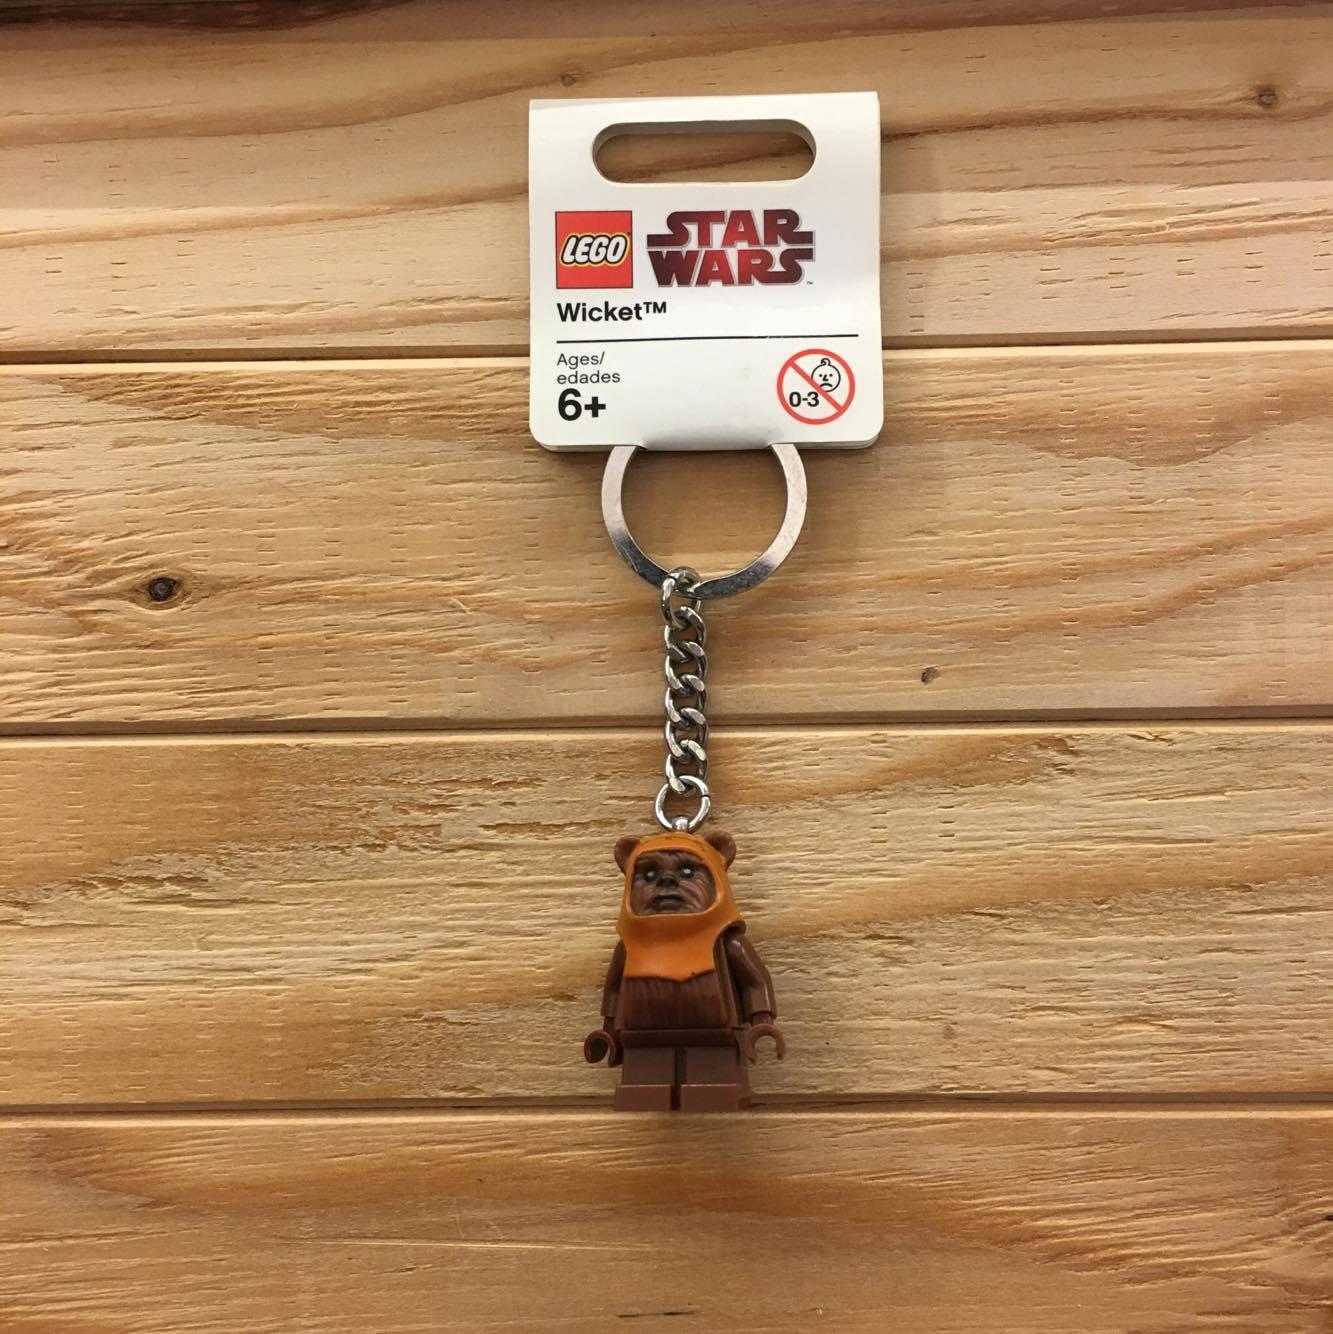 BEETLE LEGO STAR WARS 星際大戰 棕臉 伊娃族 樂高 積木 鑰匙圈 玩具 聖誕禮物